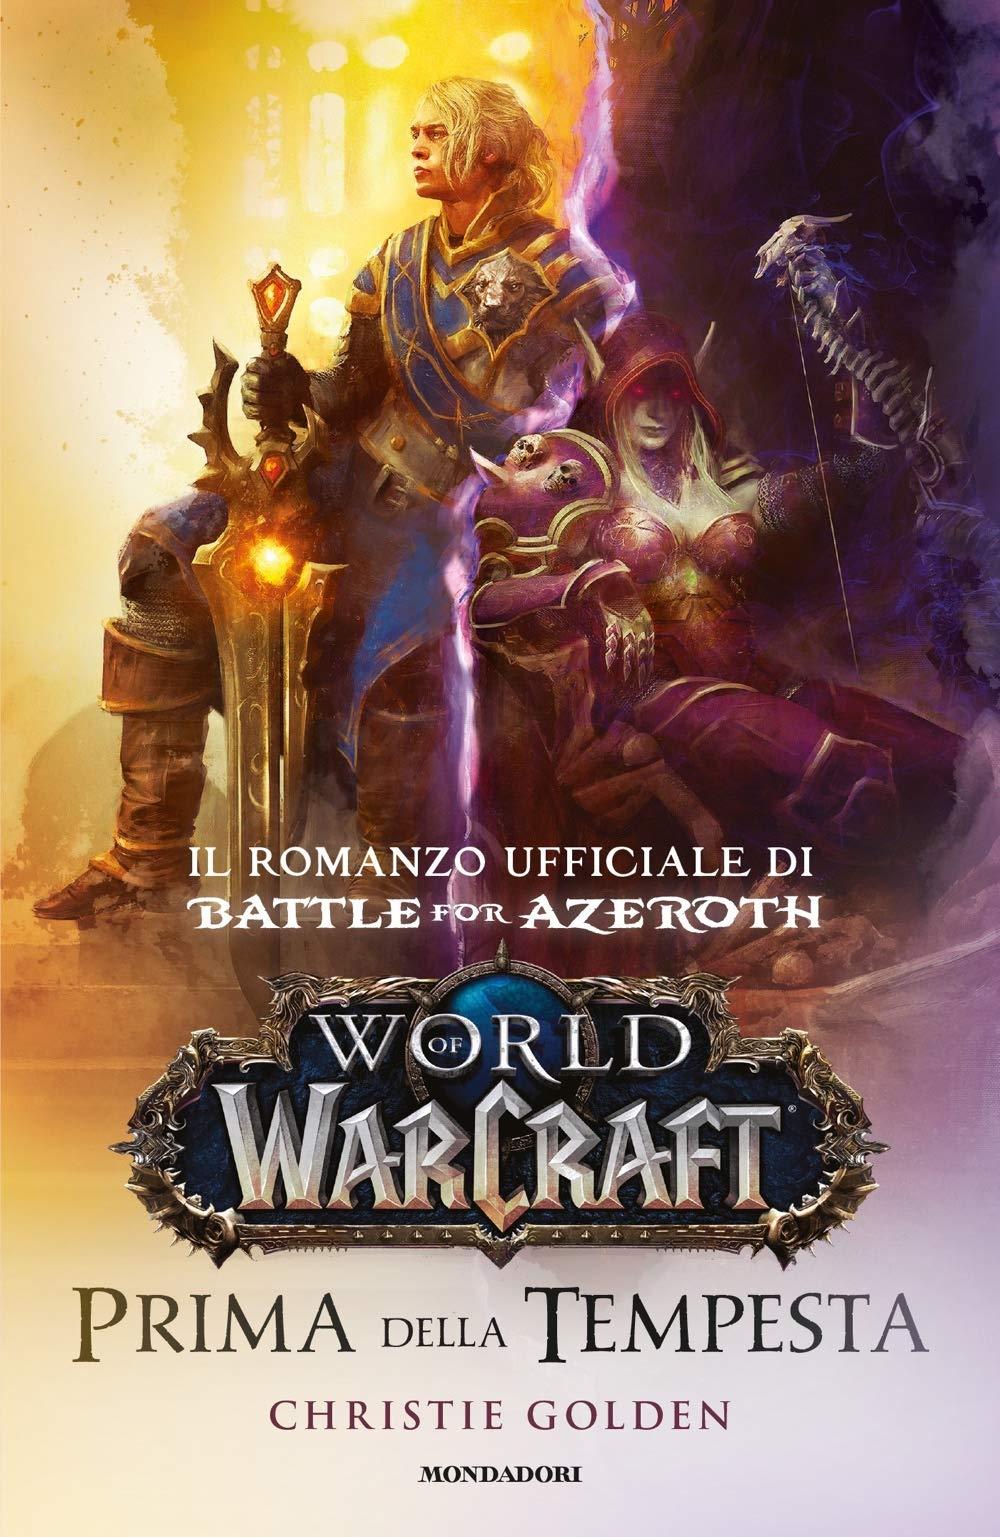 Prima della tempesta. World of Warcraft Copertina rigida – 30 ott 2018 Christie Golden Mondadori 8804687819 Fantascienza-fantasy